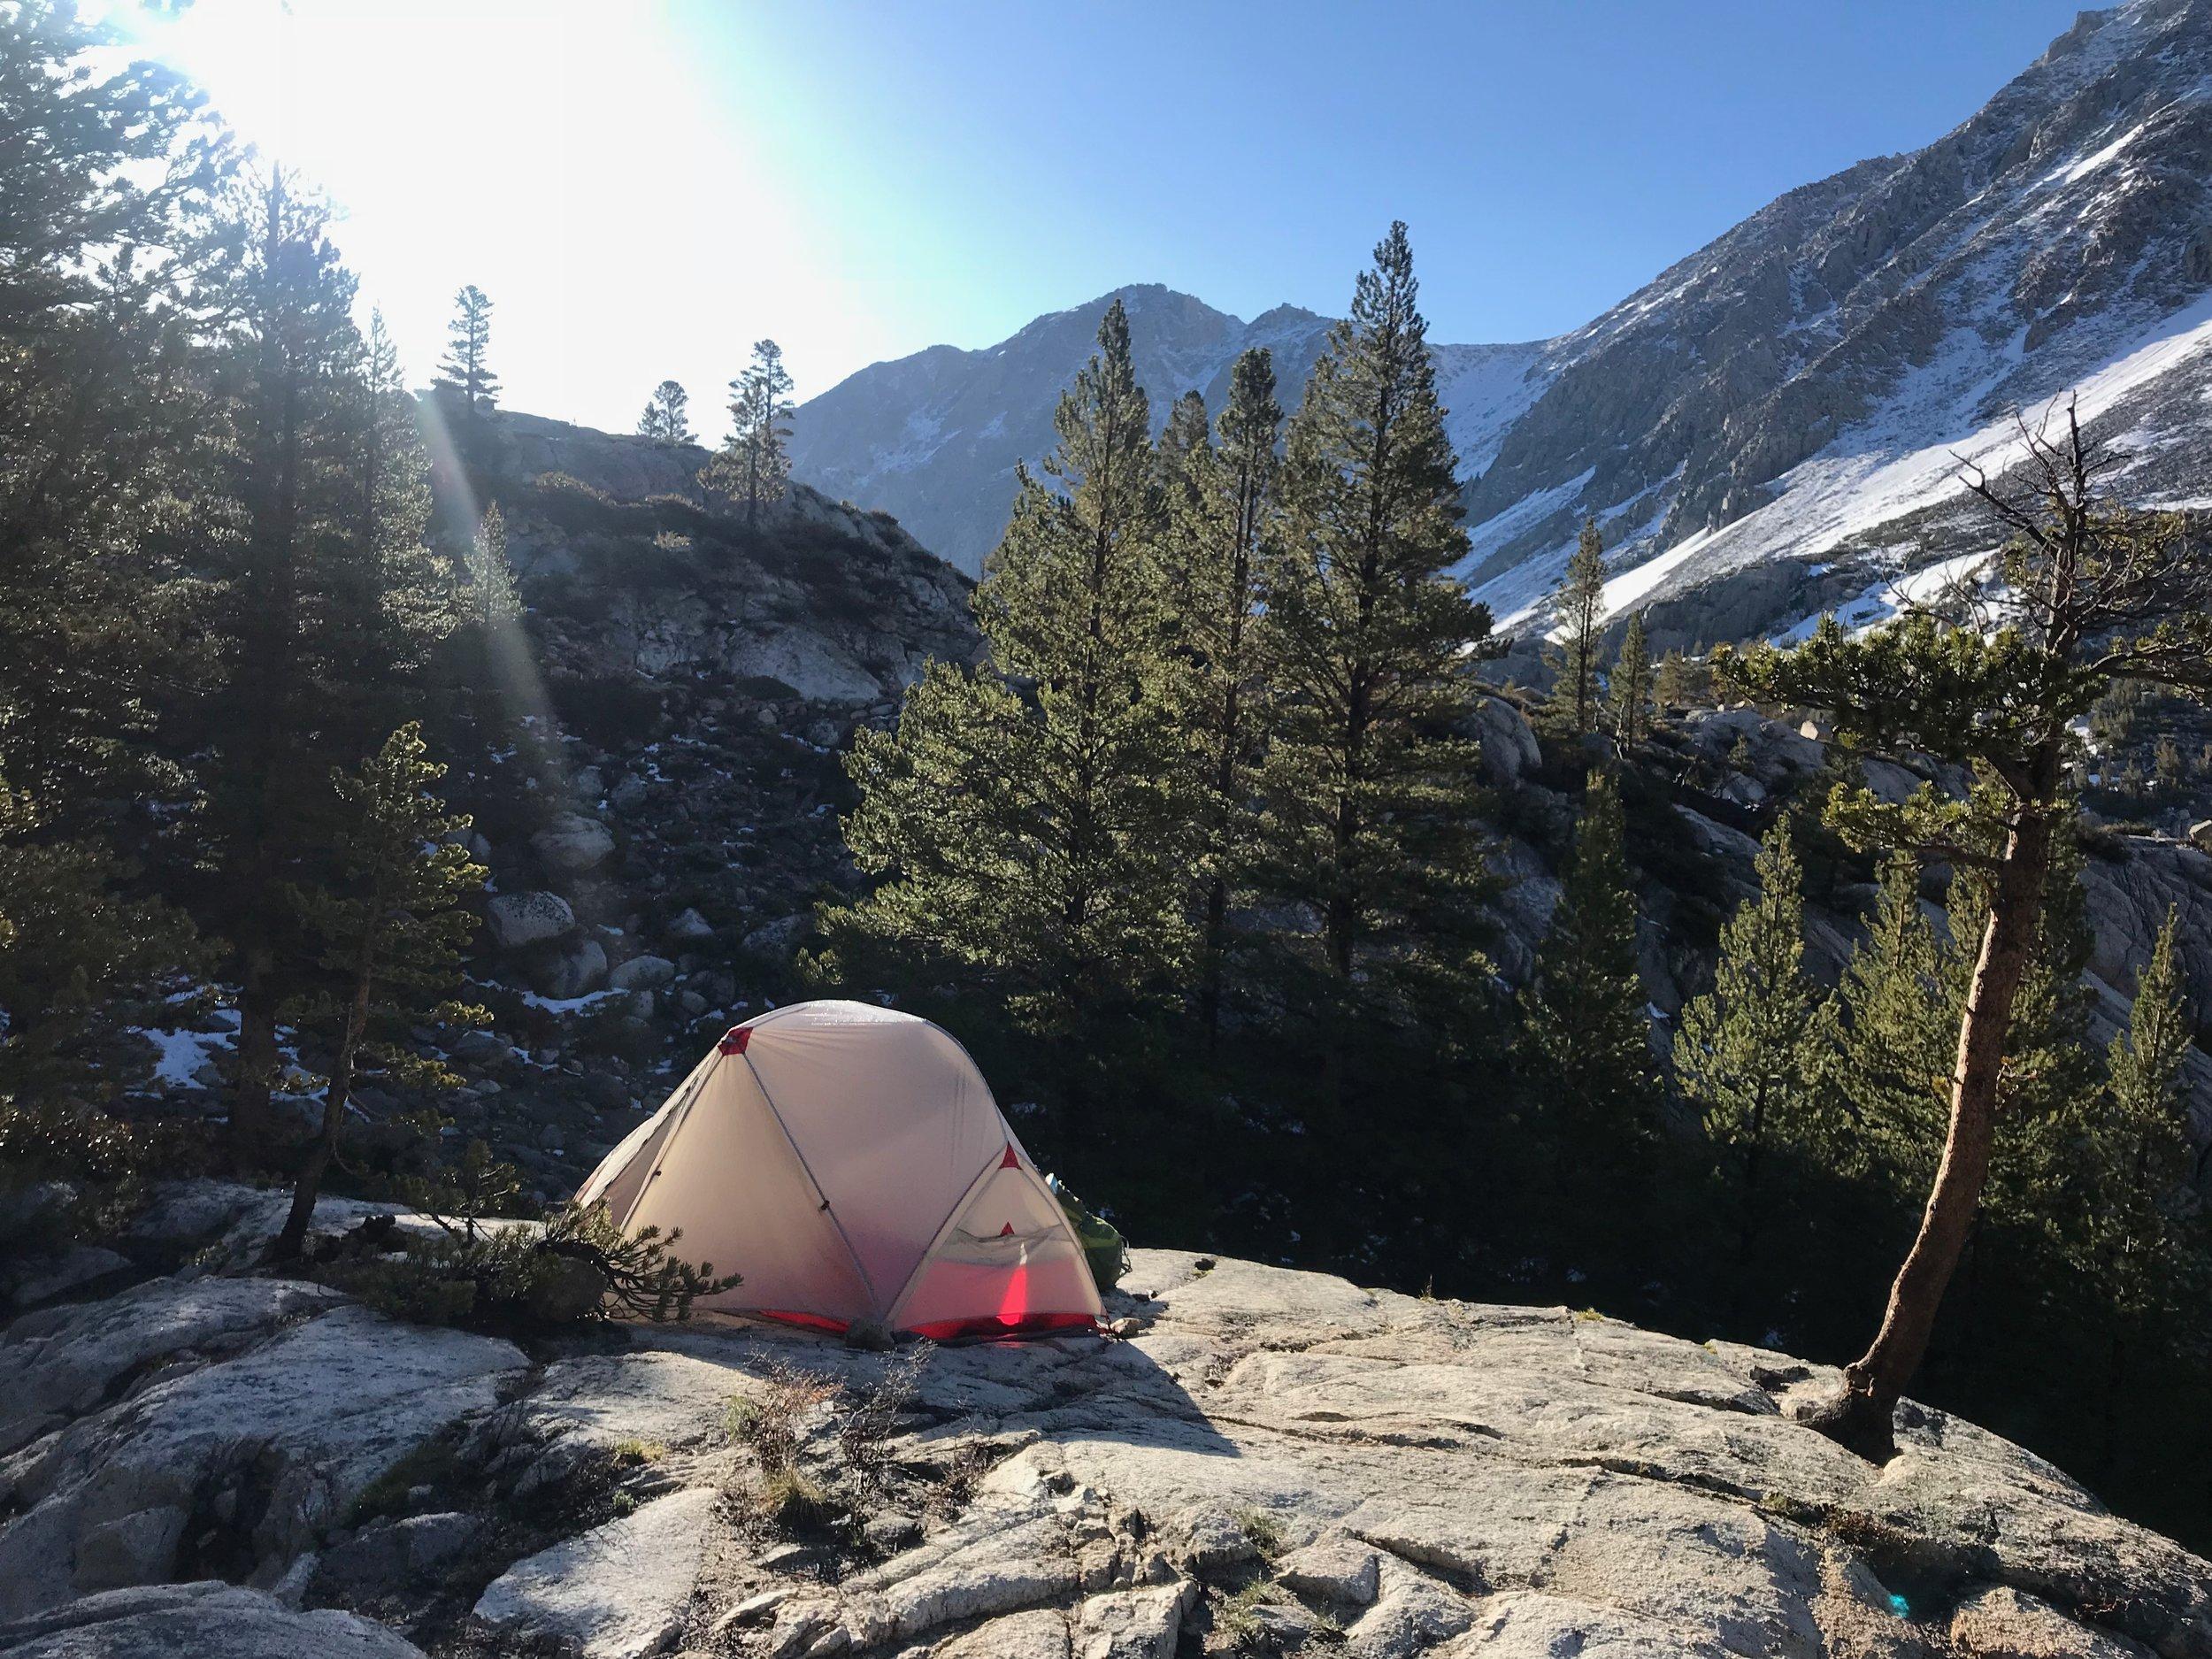 The MSR Hubba Hubba tent